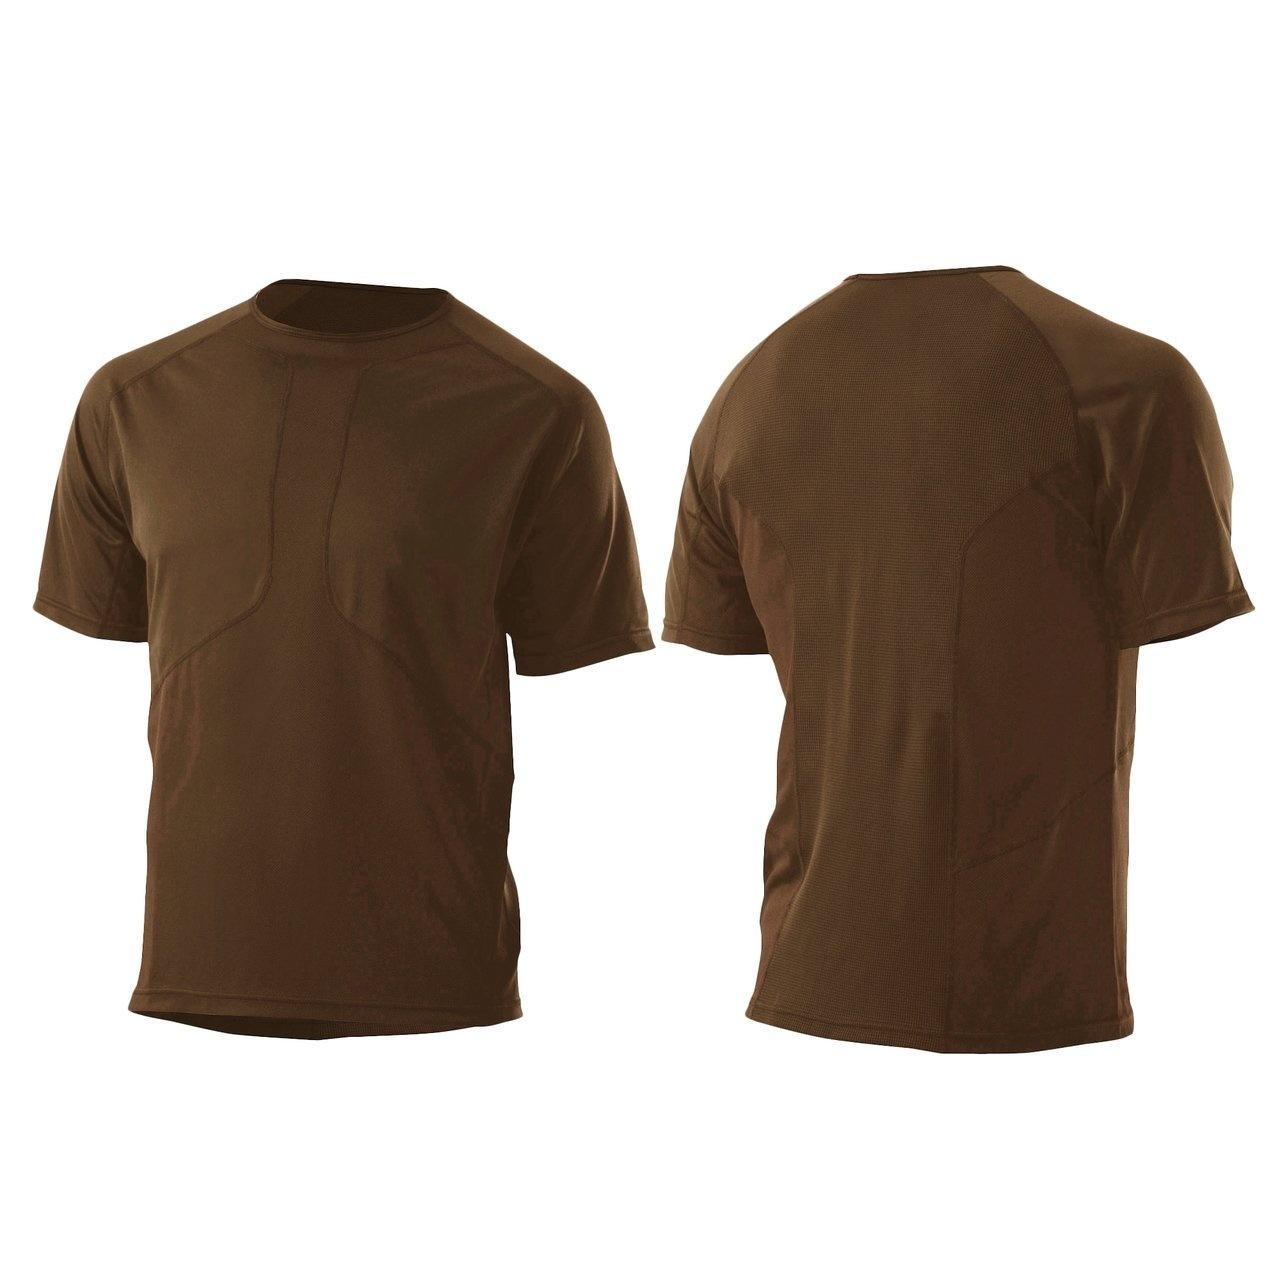 Nike Dry Men/'s Short Sleeve Training Top Shirt 848888 Medium $35